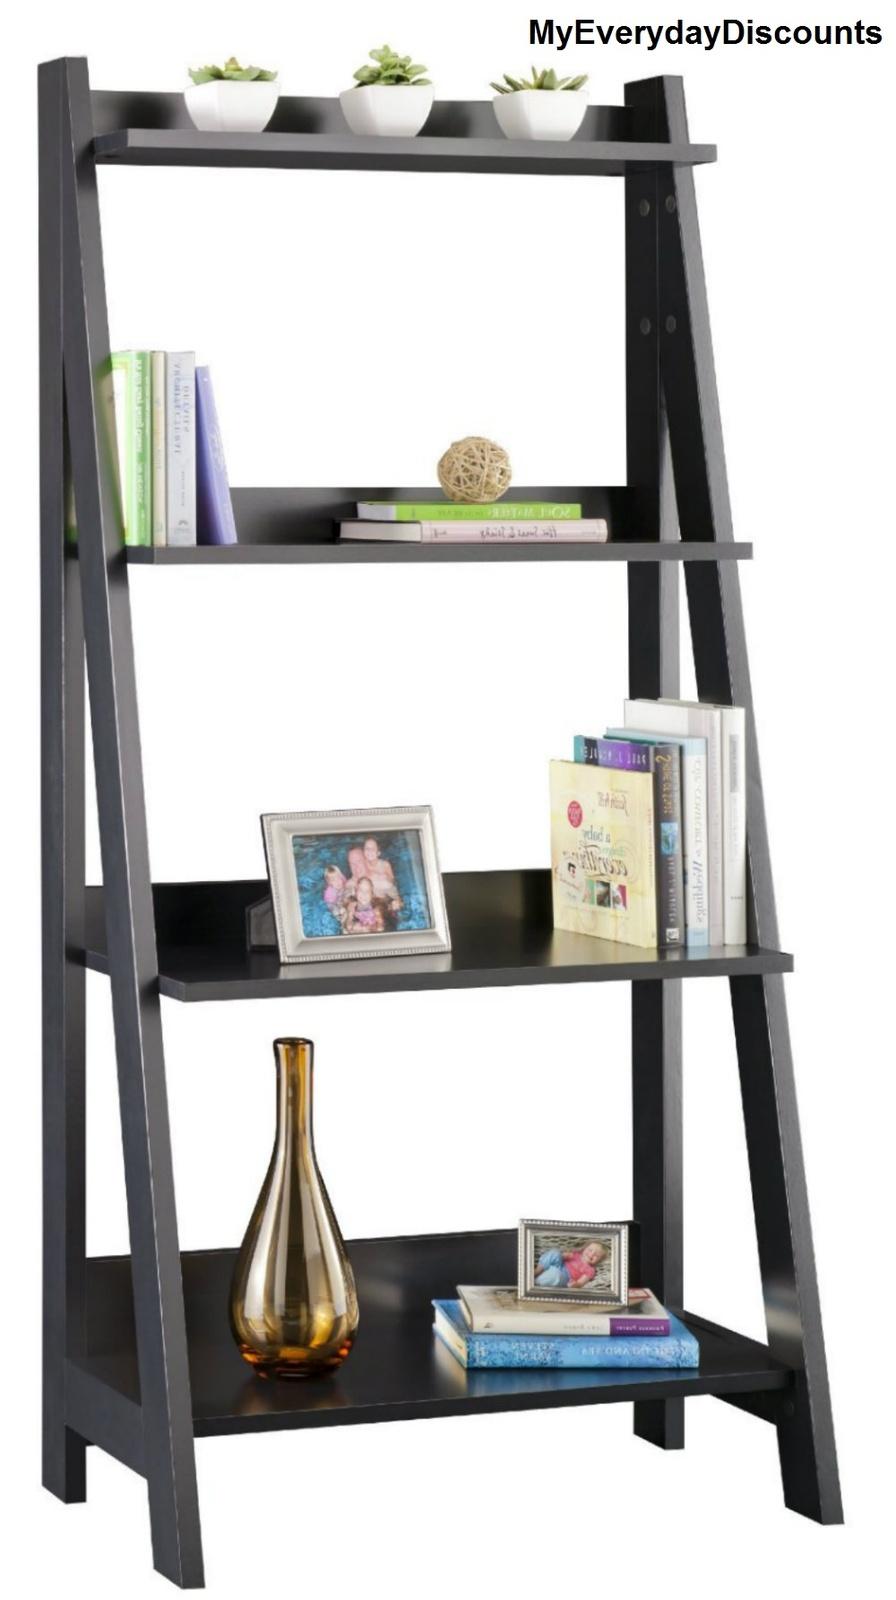 Ladder Bookcase Wood Furniture Shelf Shelves Wall Home Wall Shelves